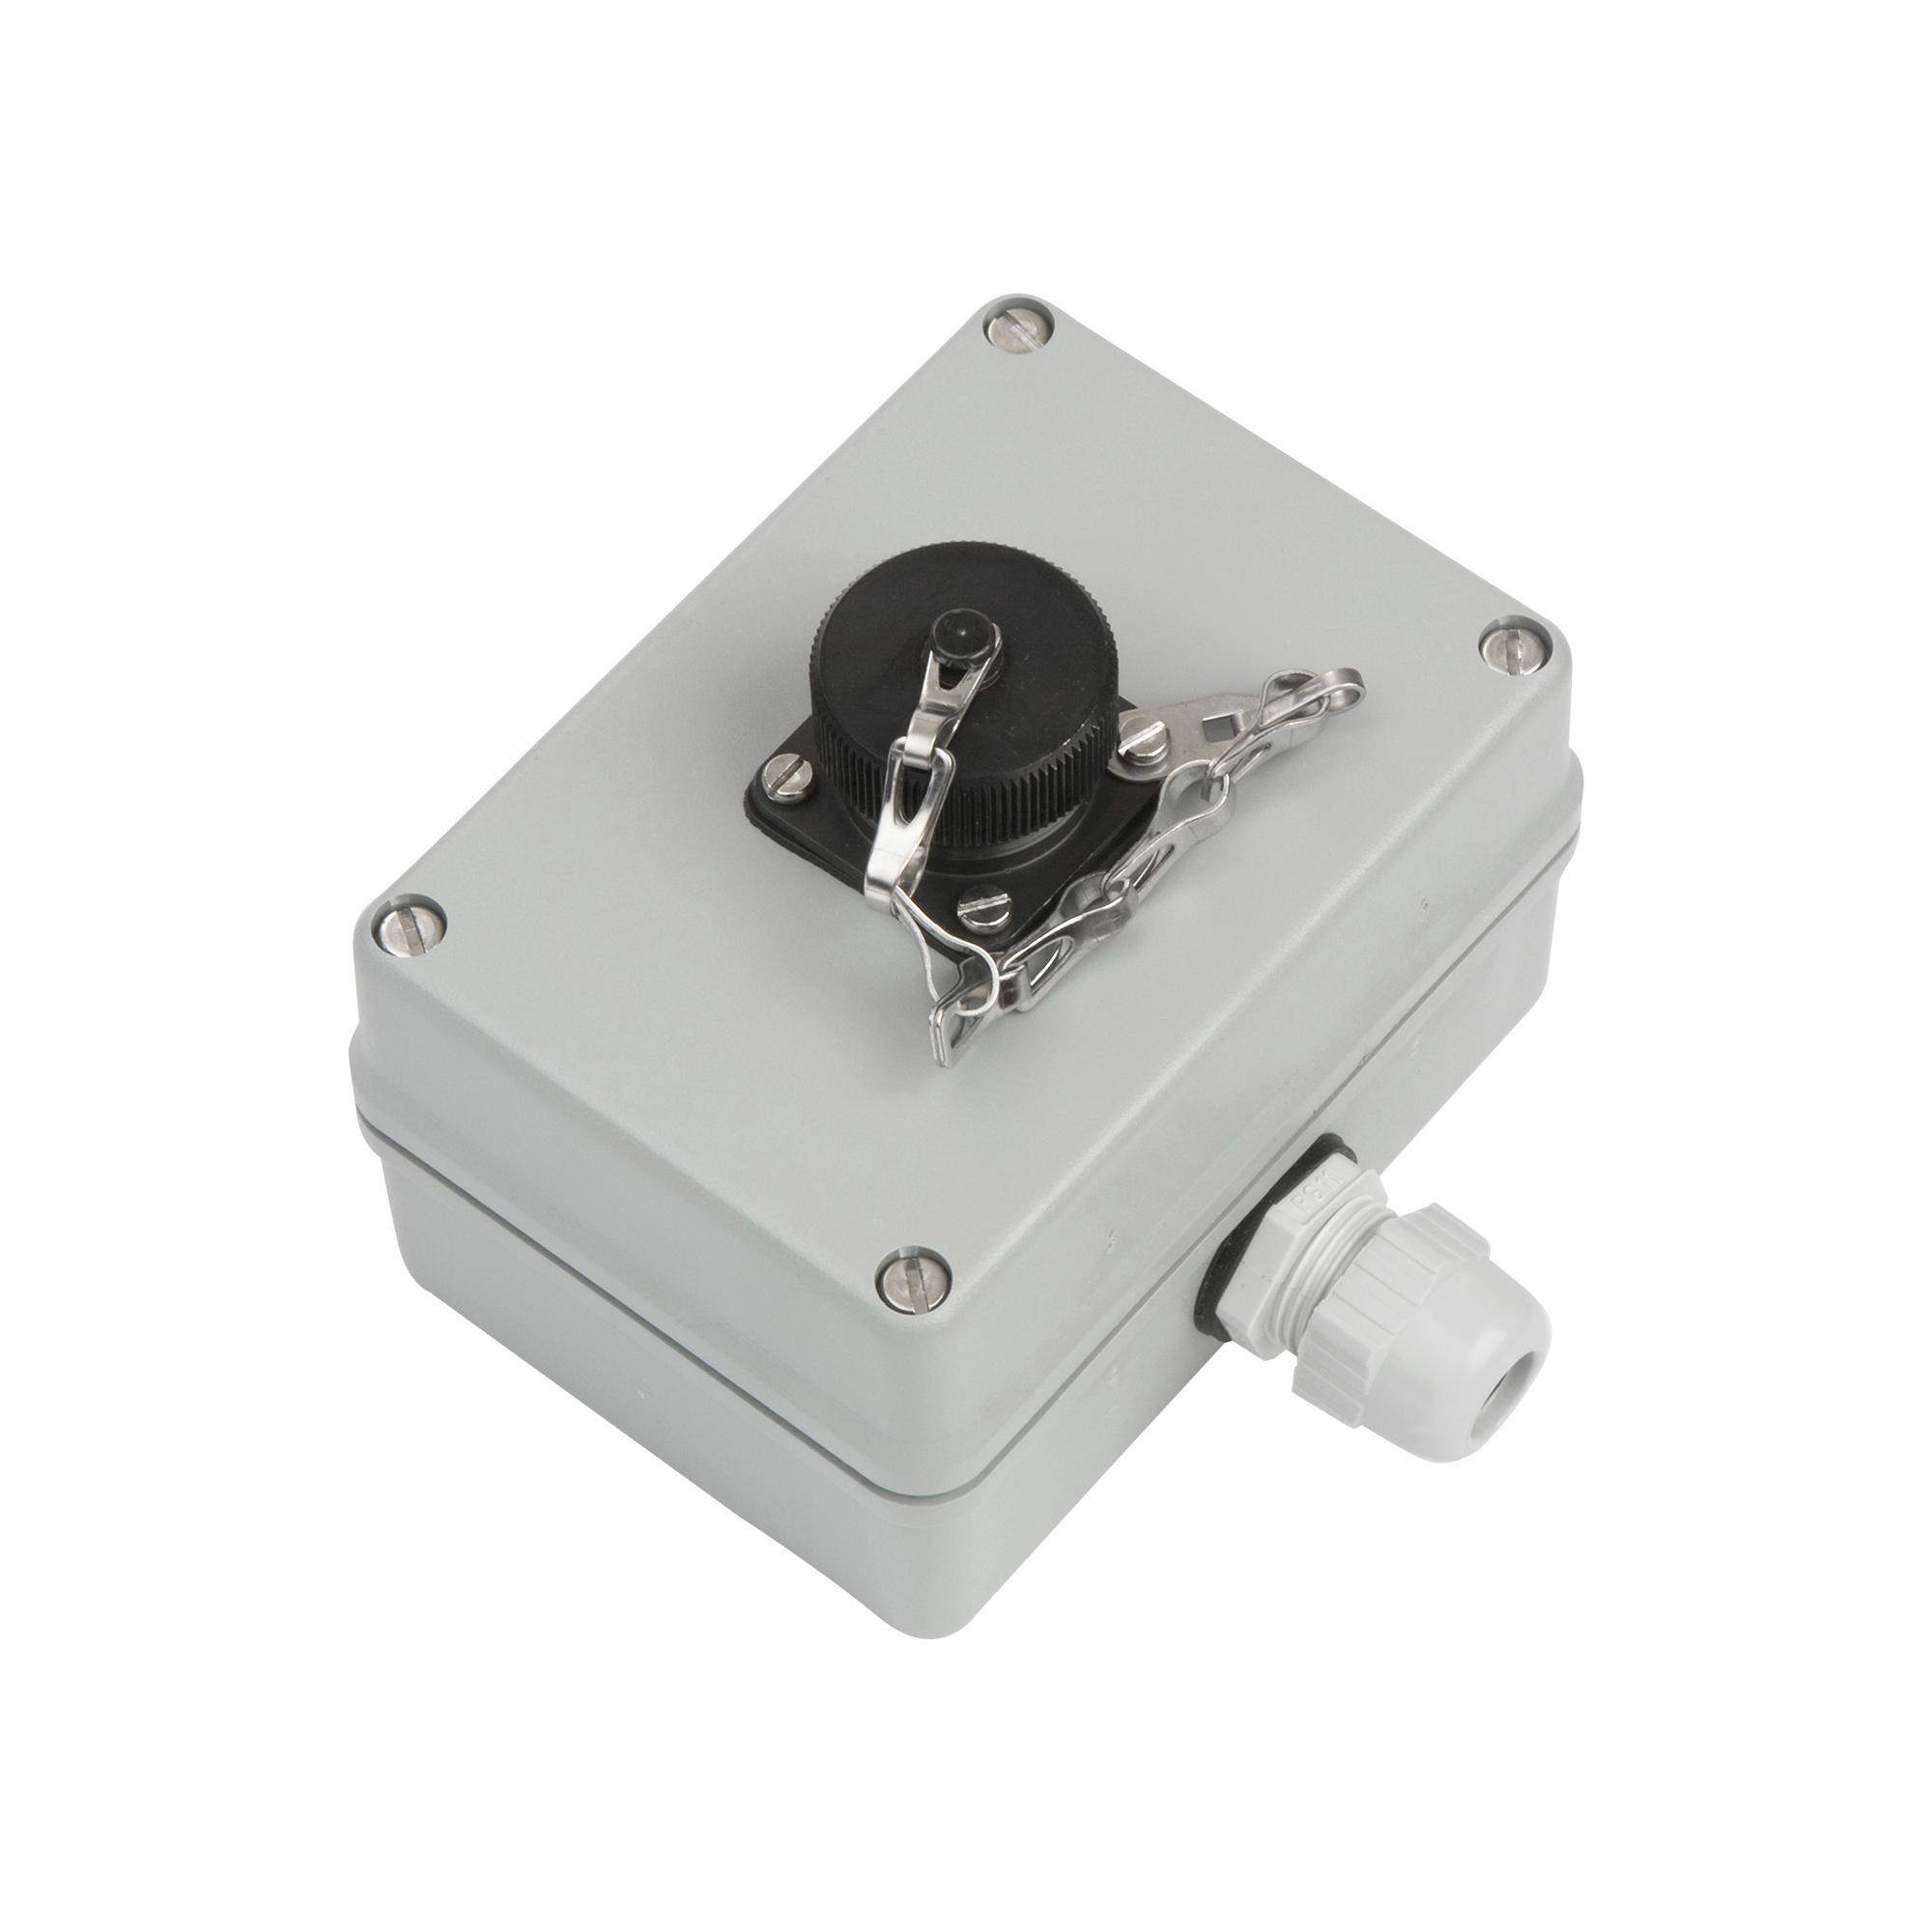 CD-7 Plugbox picture